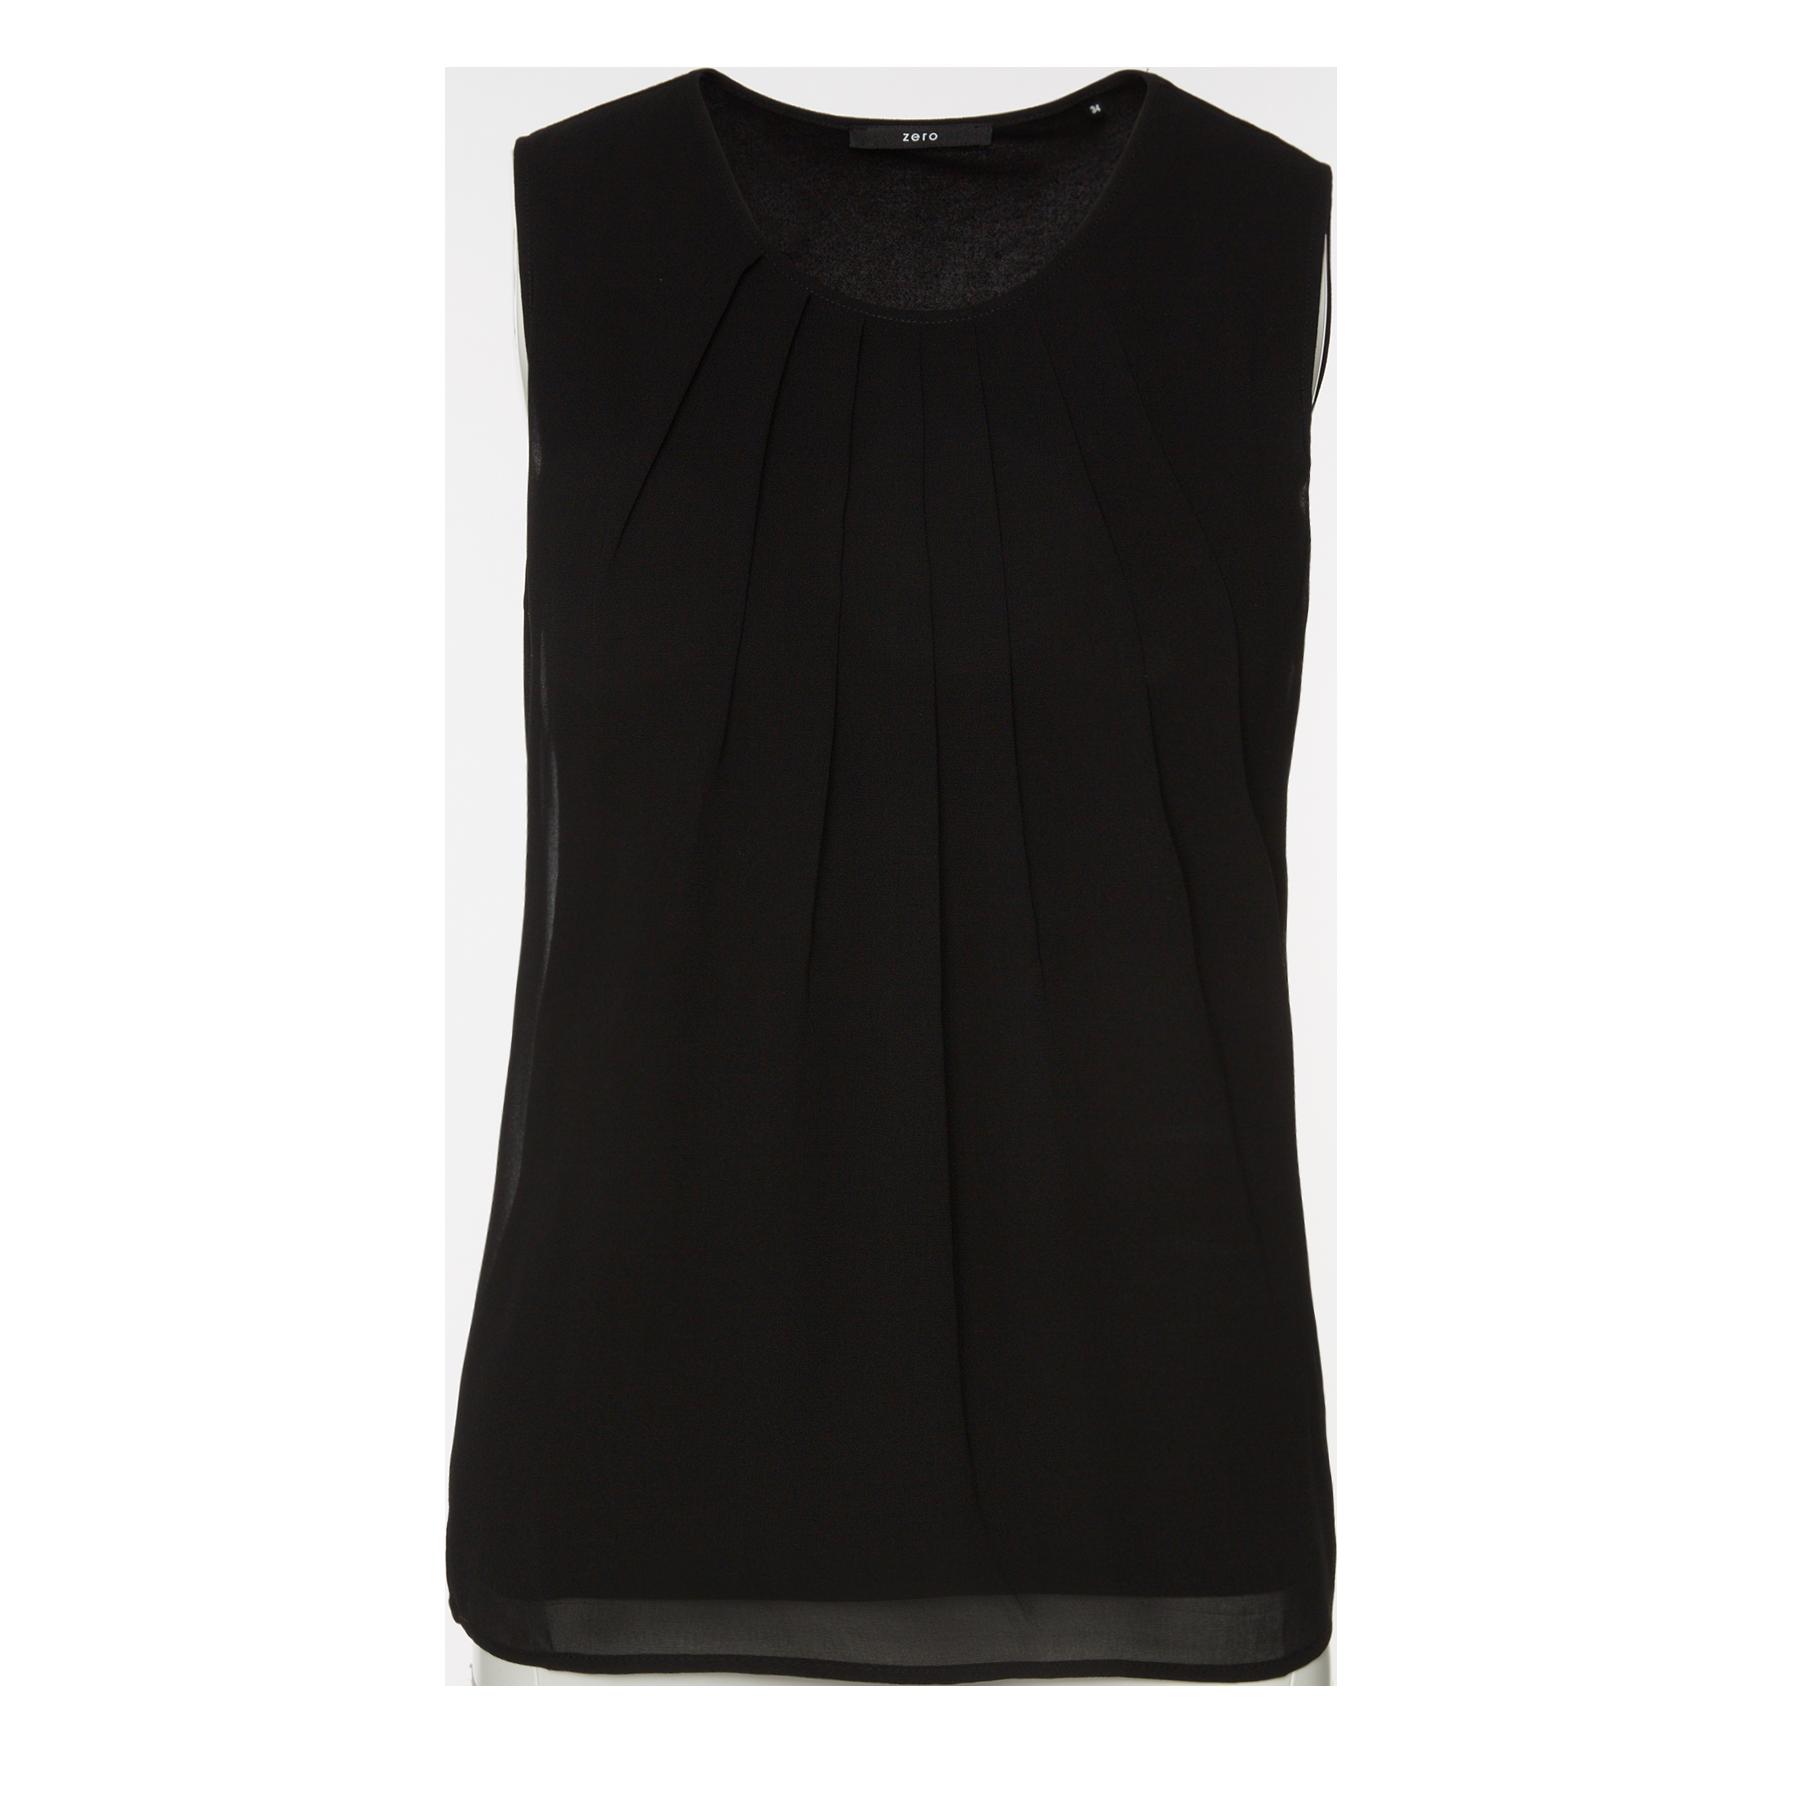 Top aus eleganter Crêpe-Qualität black